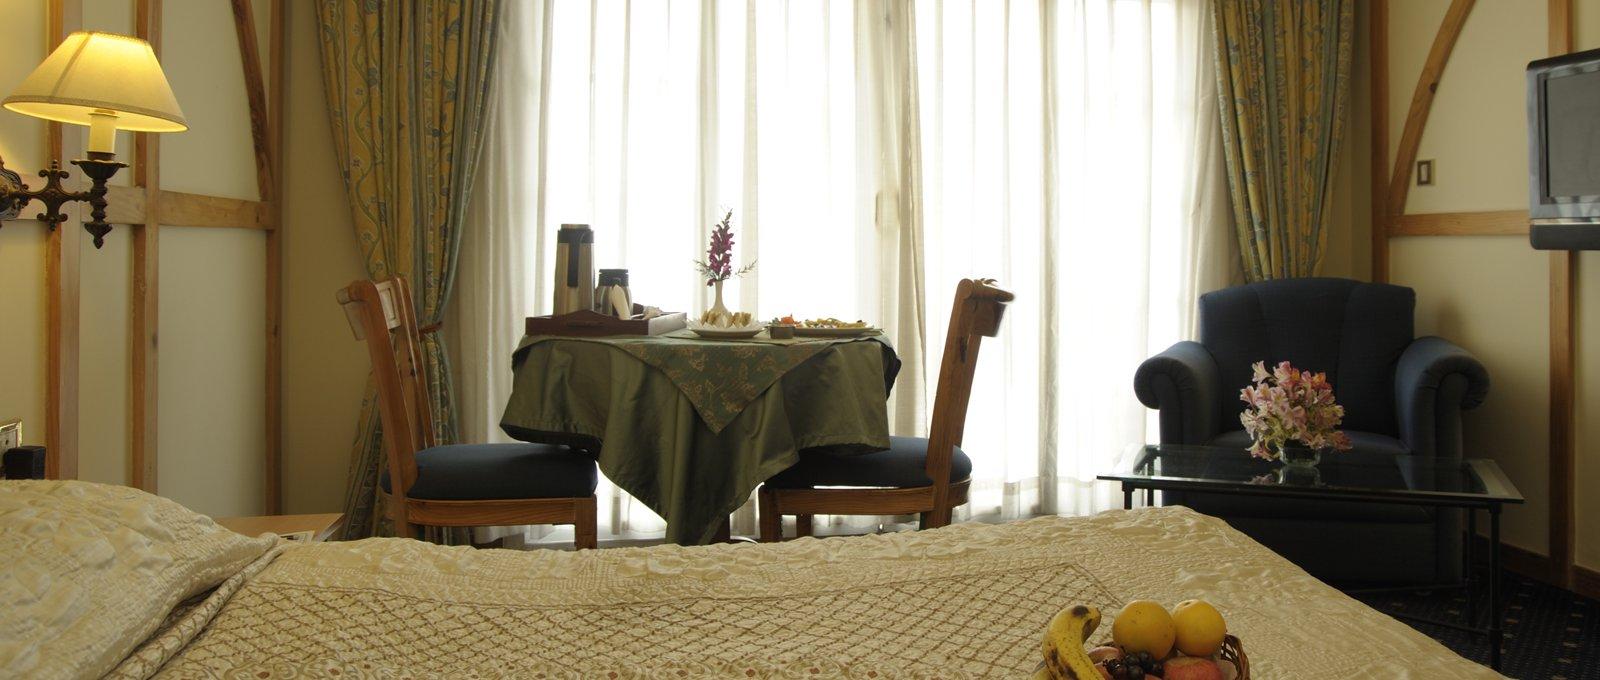 Hotel Nahar Nilgiris